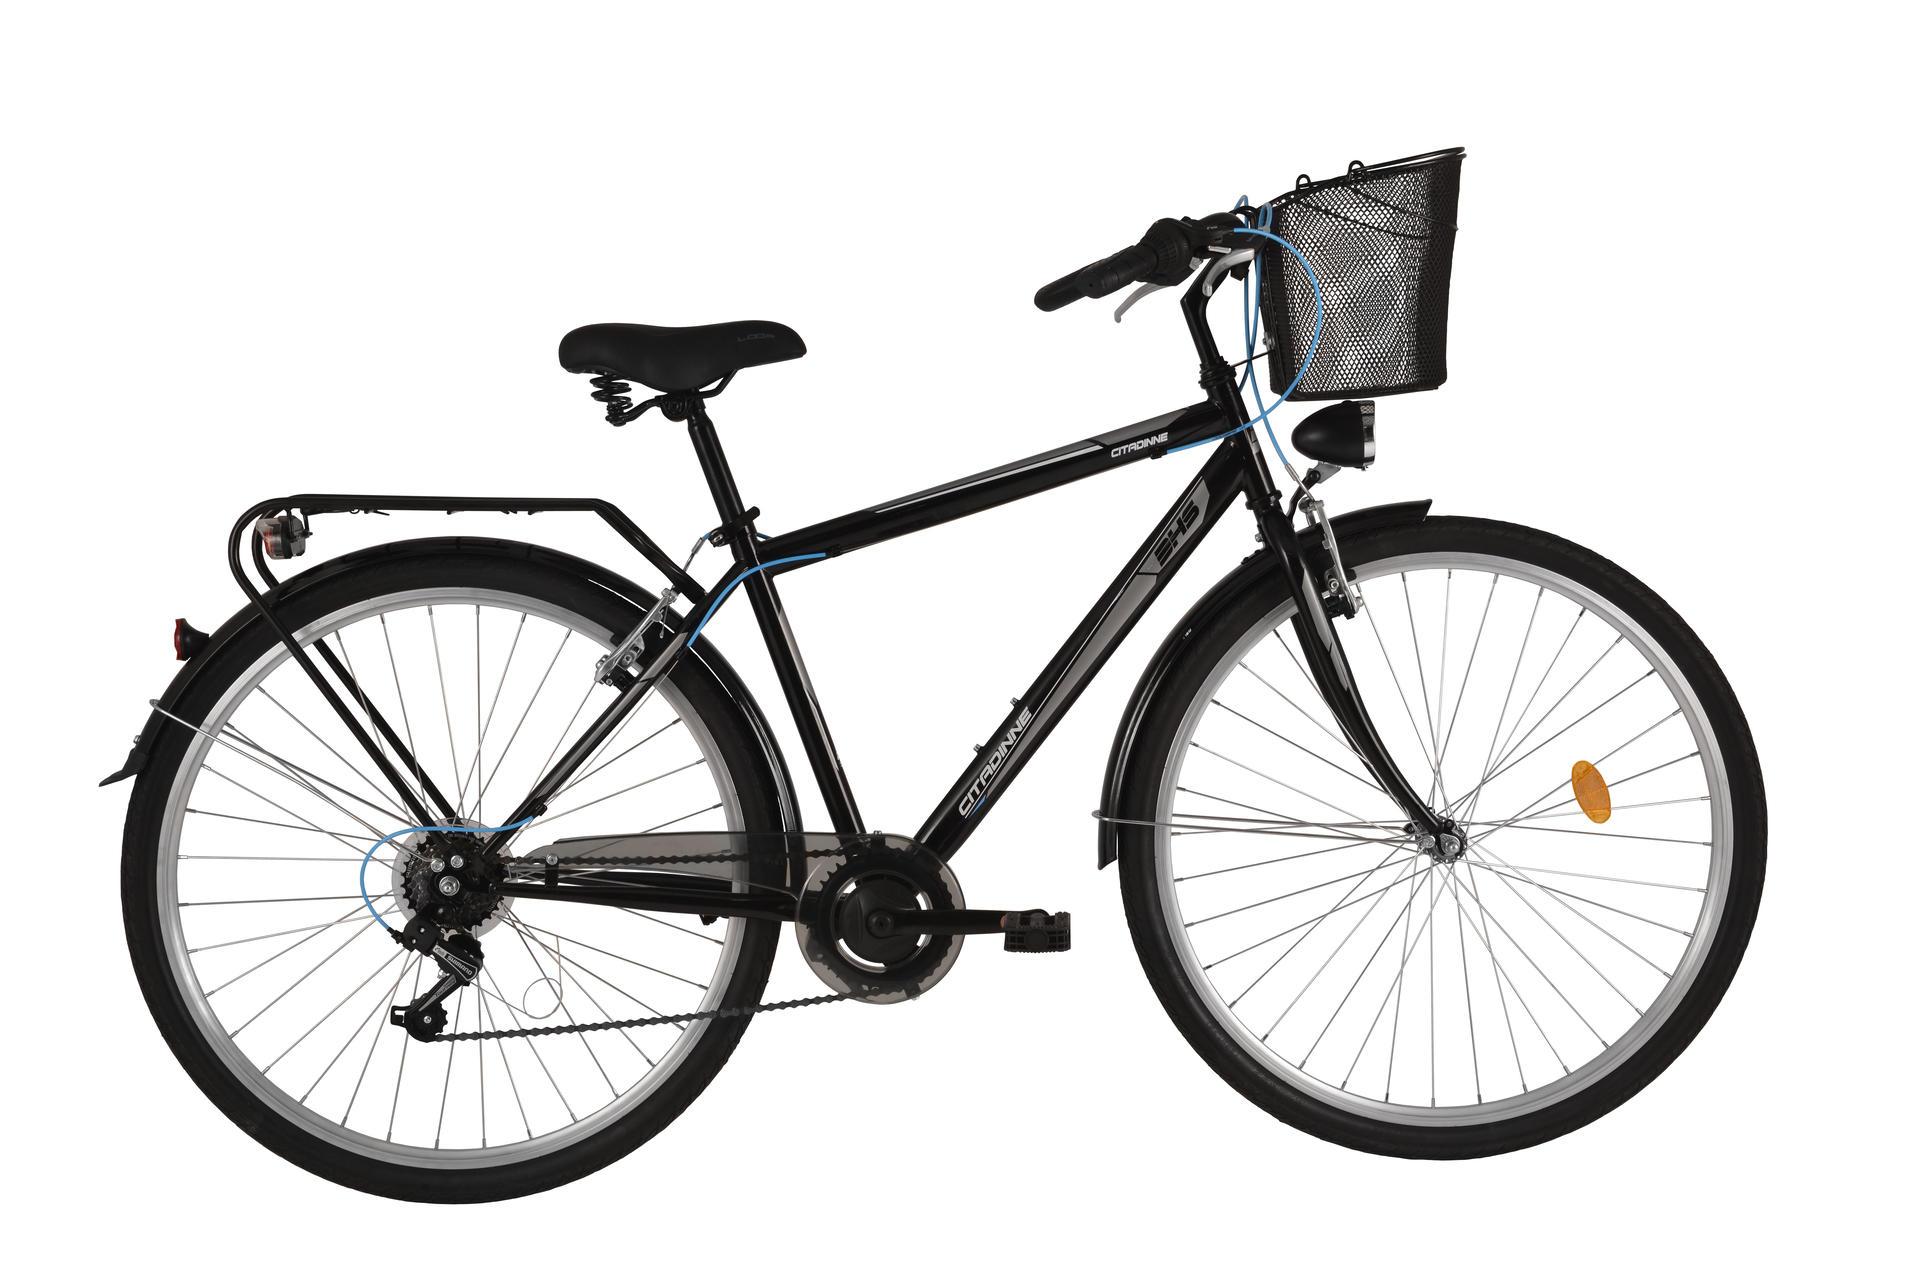 Bicicletta Uomo Da Città Dhs Citadinne 2833 Black 520mm